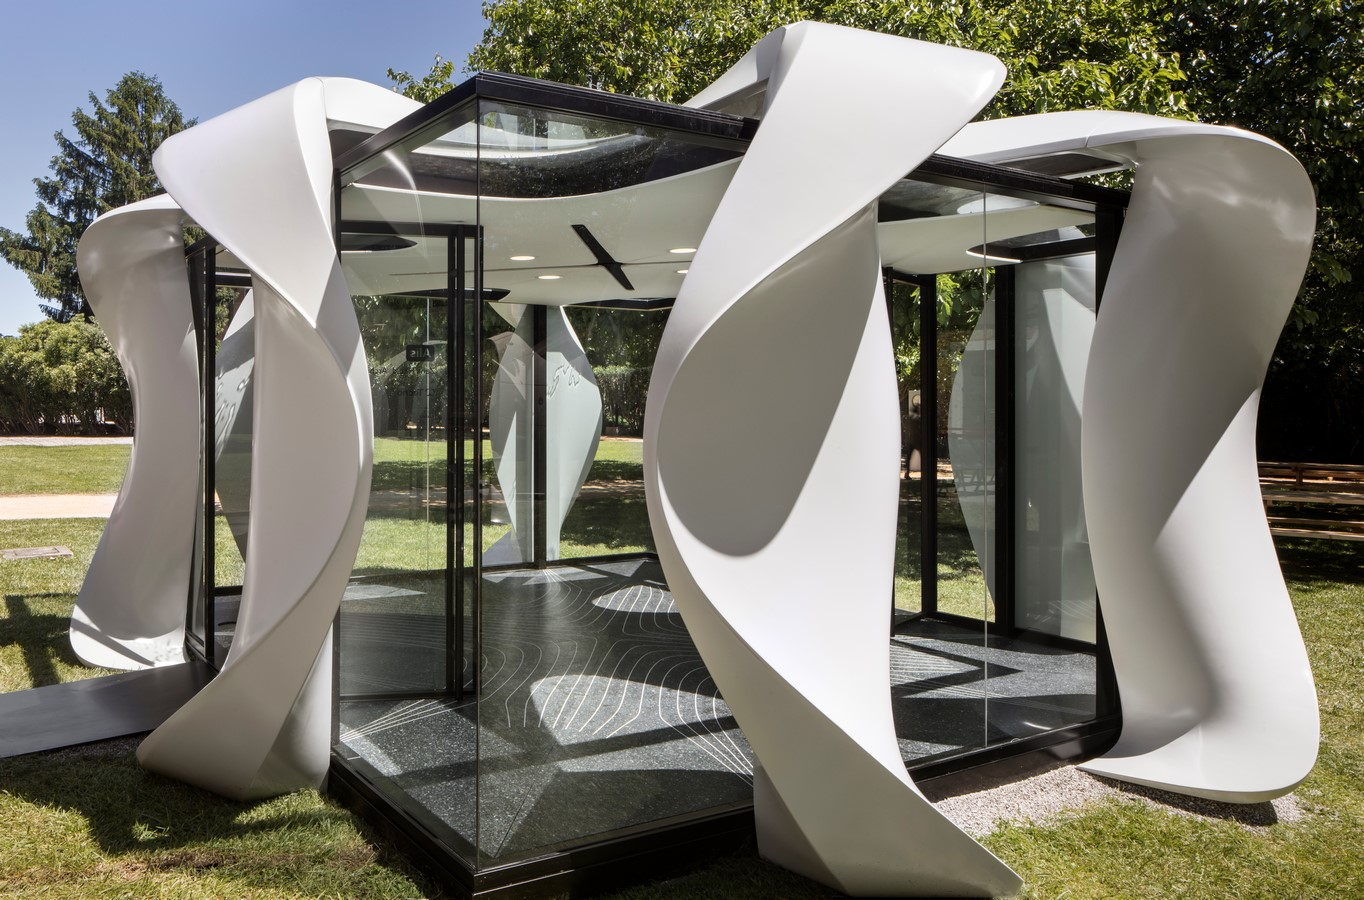 High-performing Urban Ecologies by Zaha Hadid Architects - Sheet3